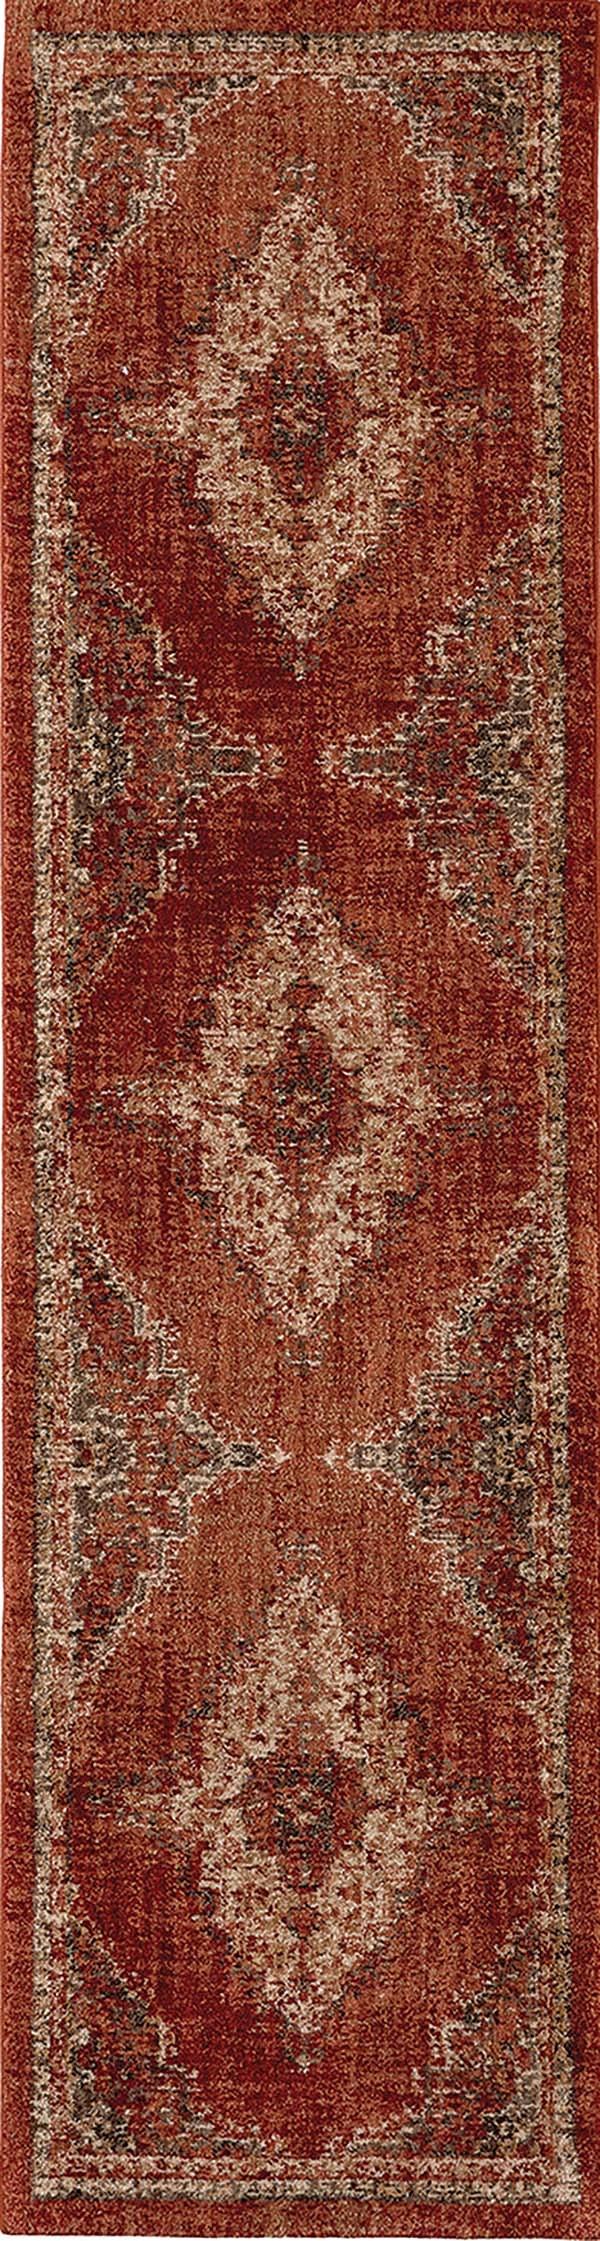 Spice (90935-20044) Bohemian Area Rug